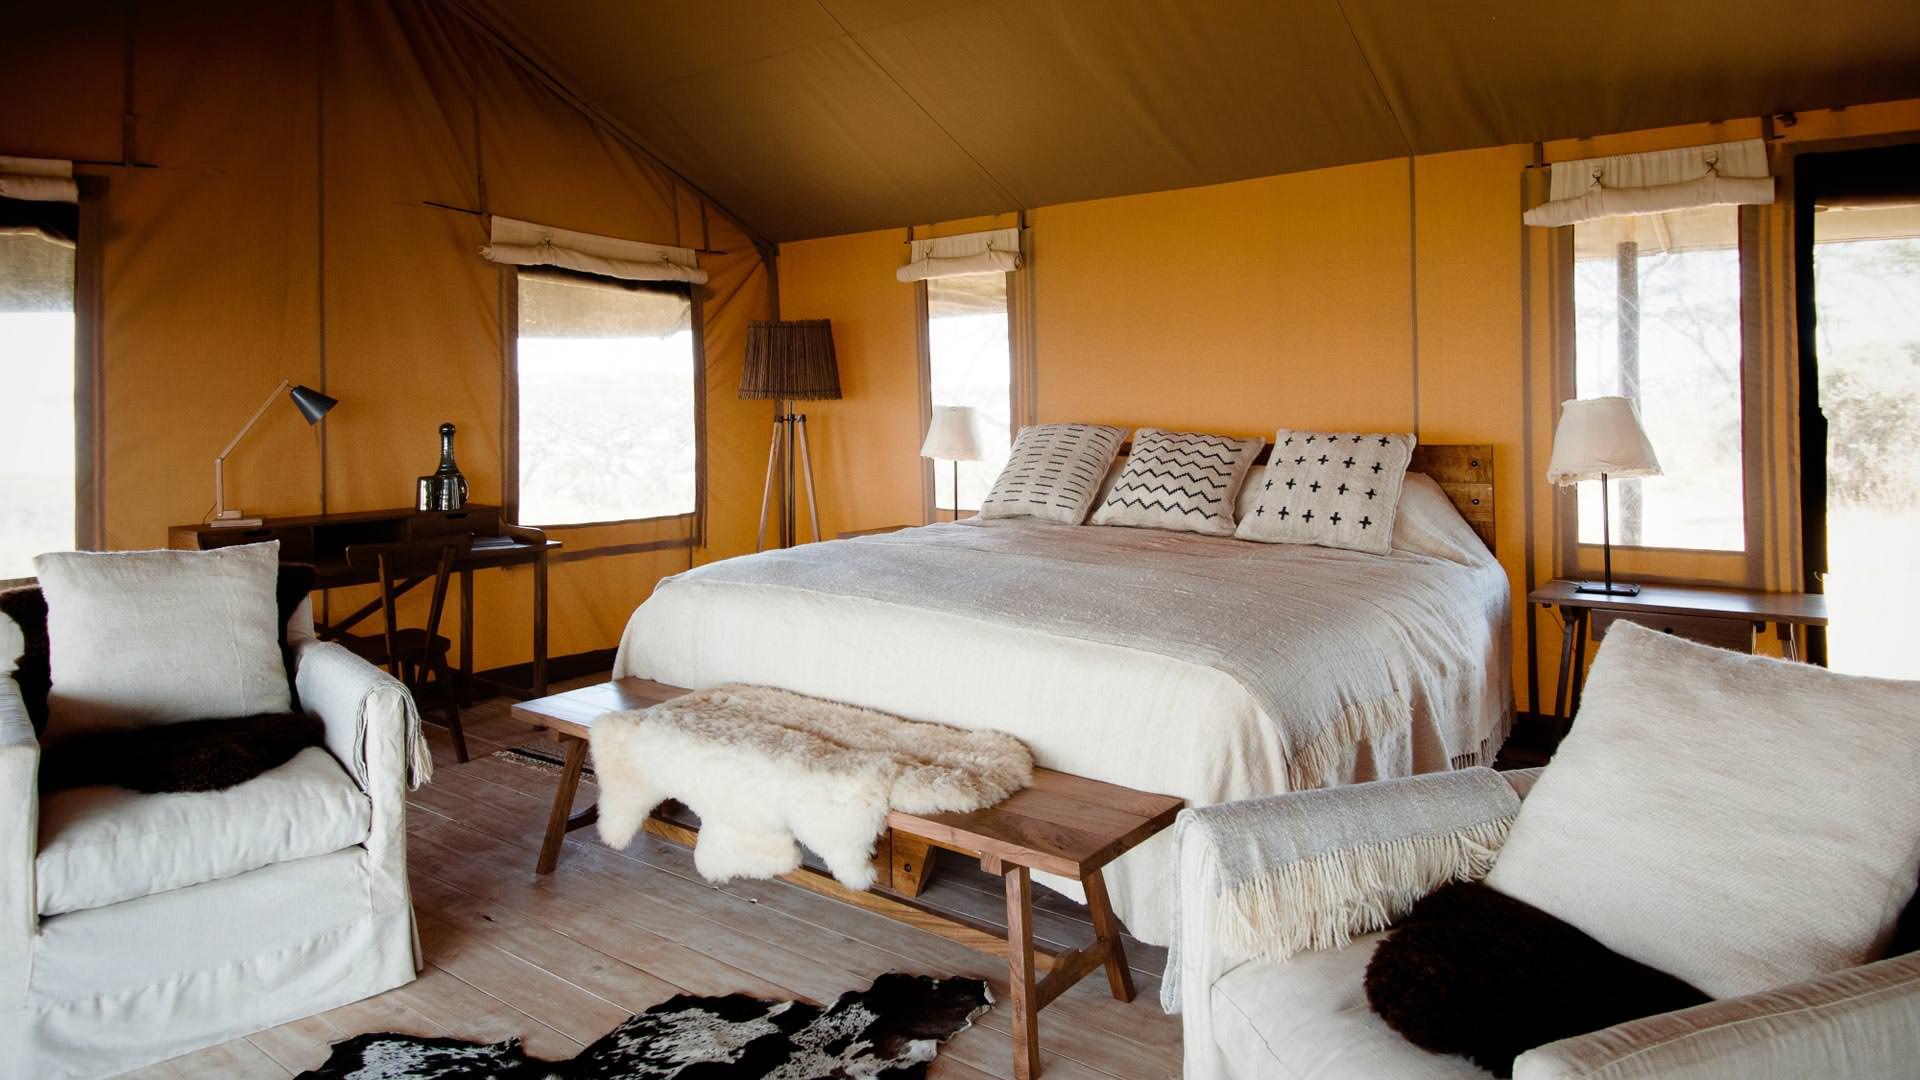 Double tent setup